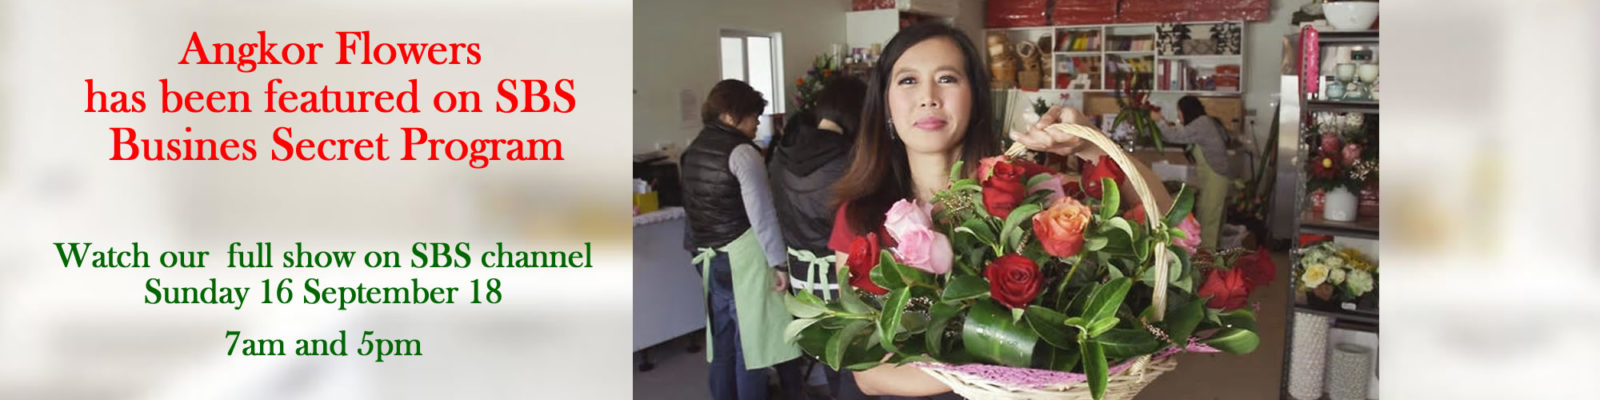 Angkor flowers- SBS show september 18